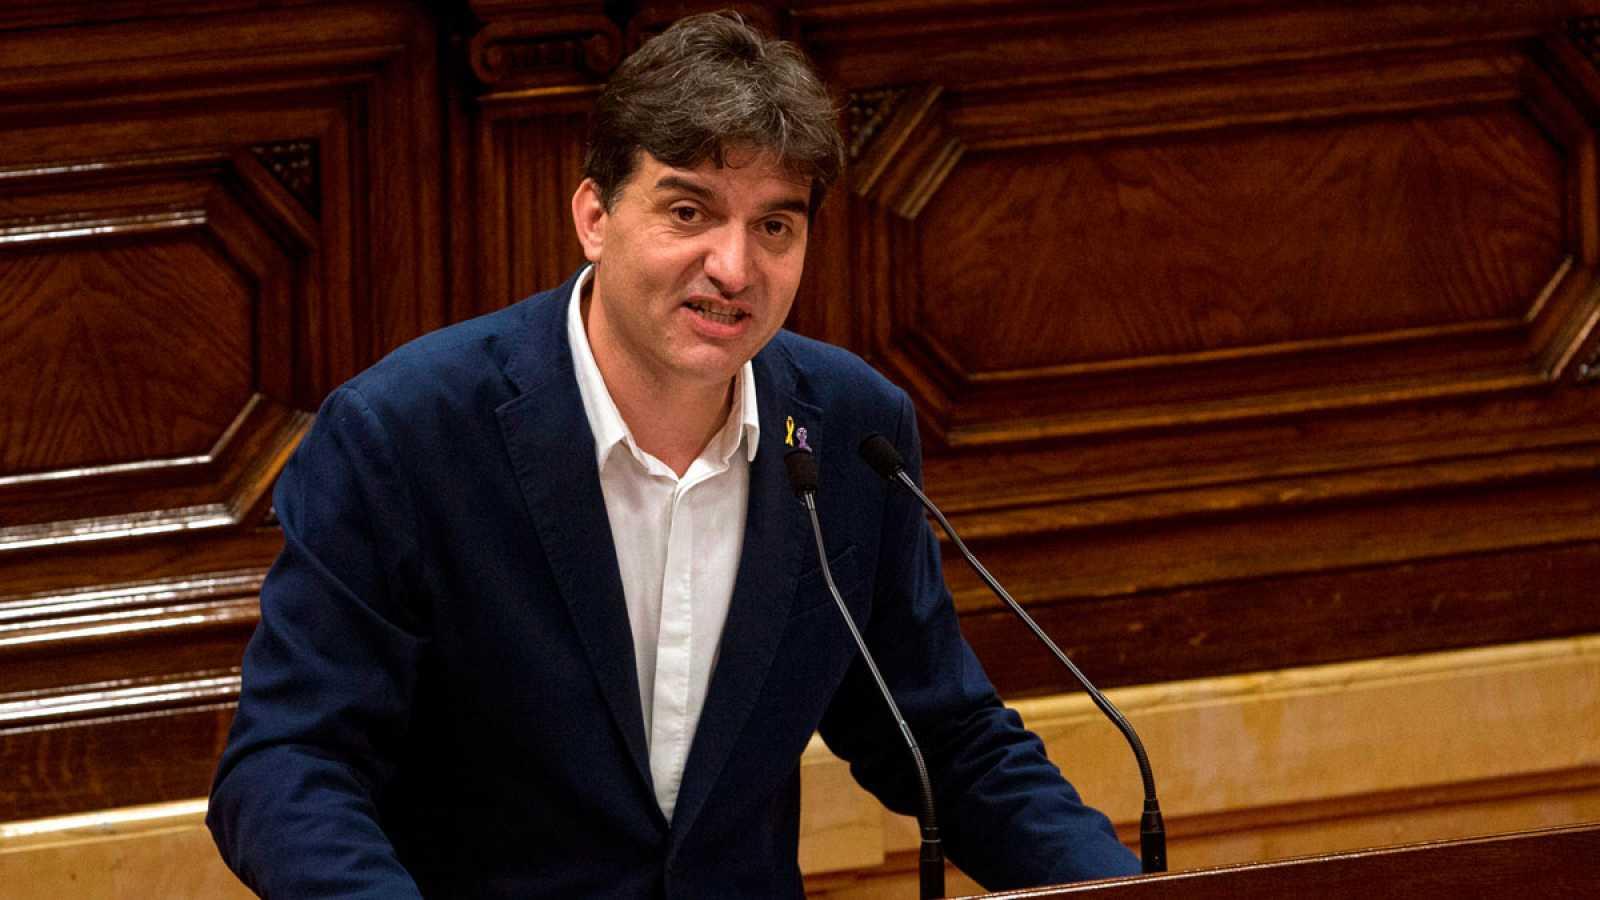 Discurso íntegro de Sergi Sabrià (ERC) en el debate de investidura de Quim Torra